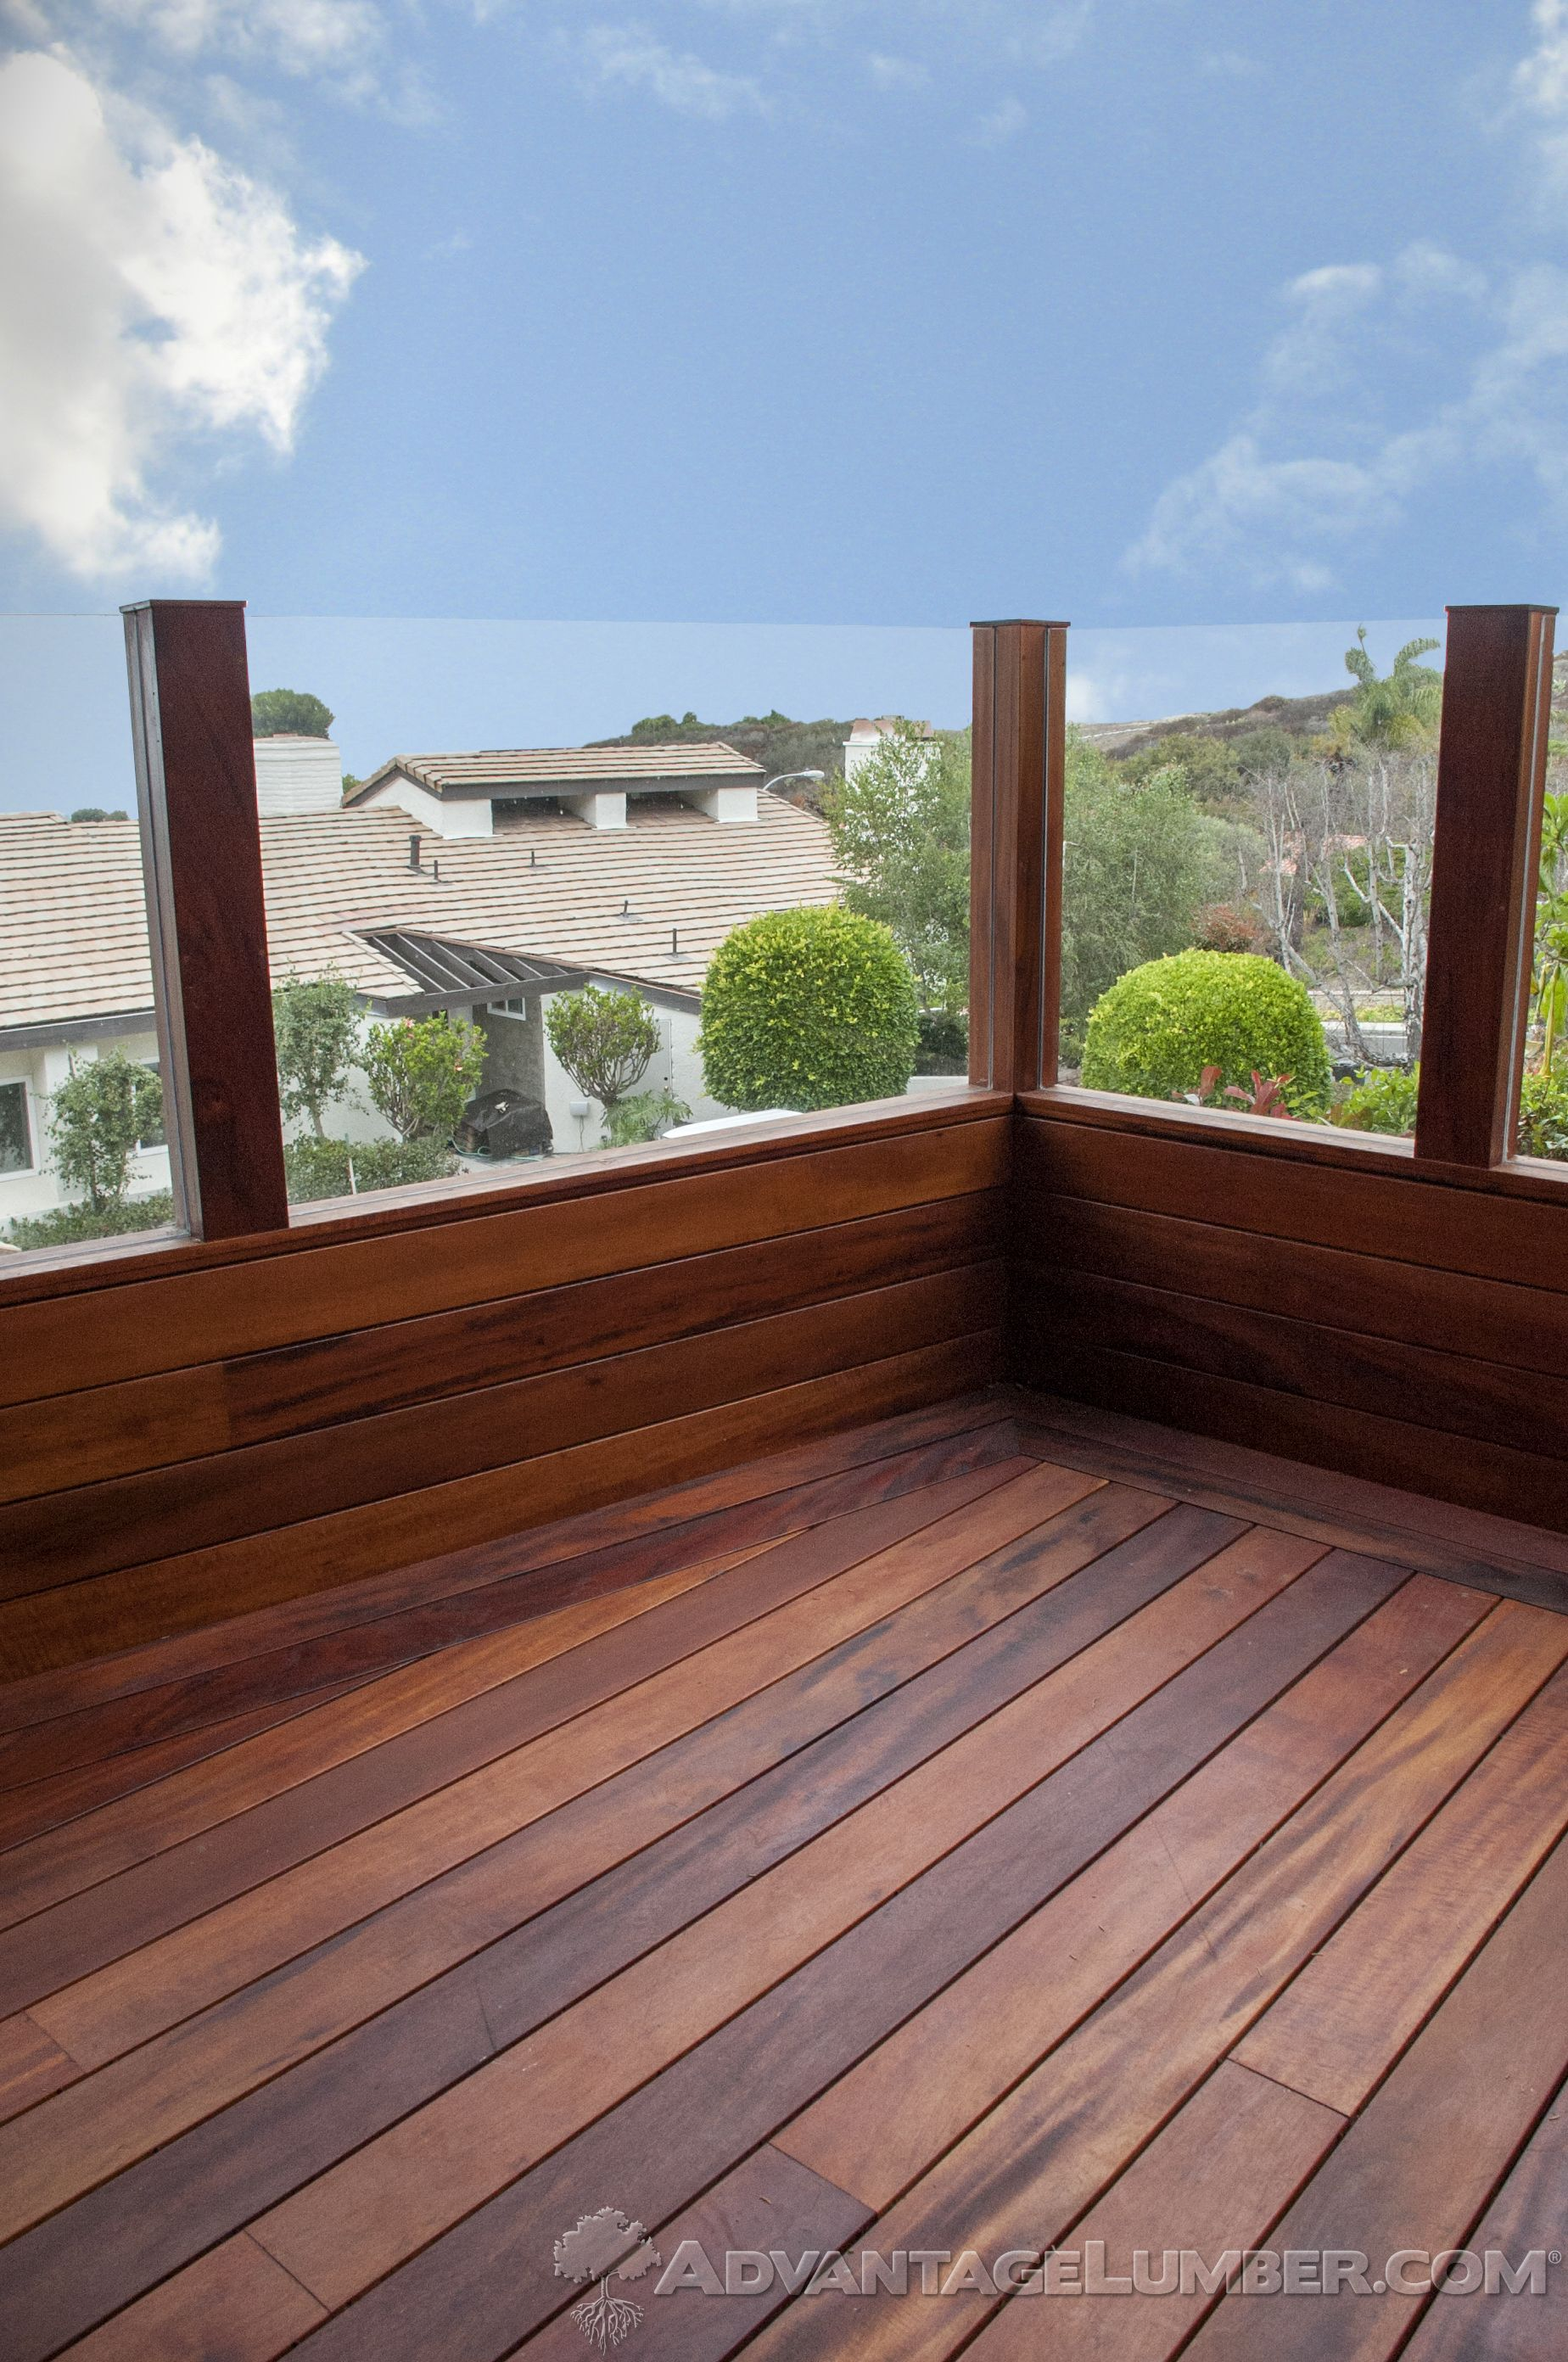 Plastic Sheets For Boat Floors Building A Deck Decks Backyard Deck Design Plans